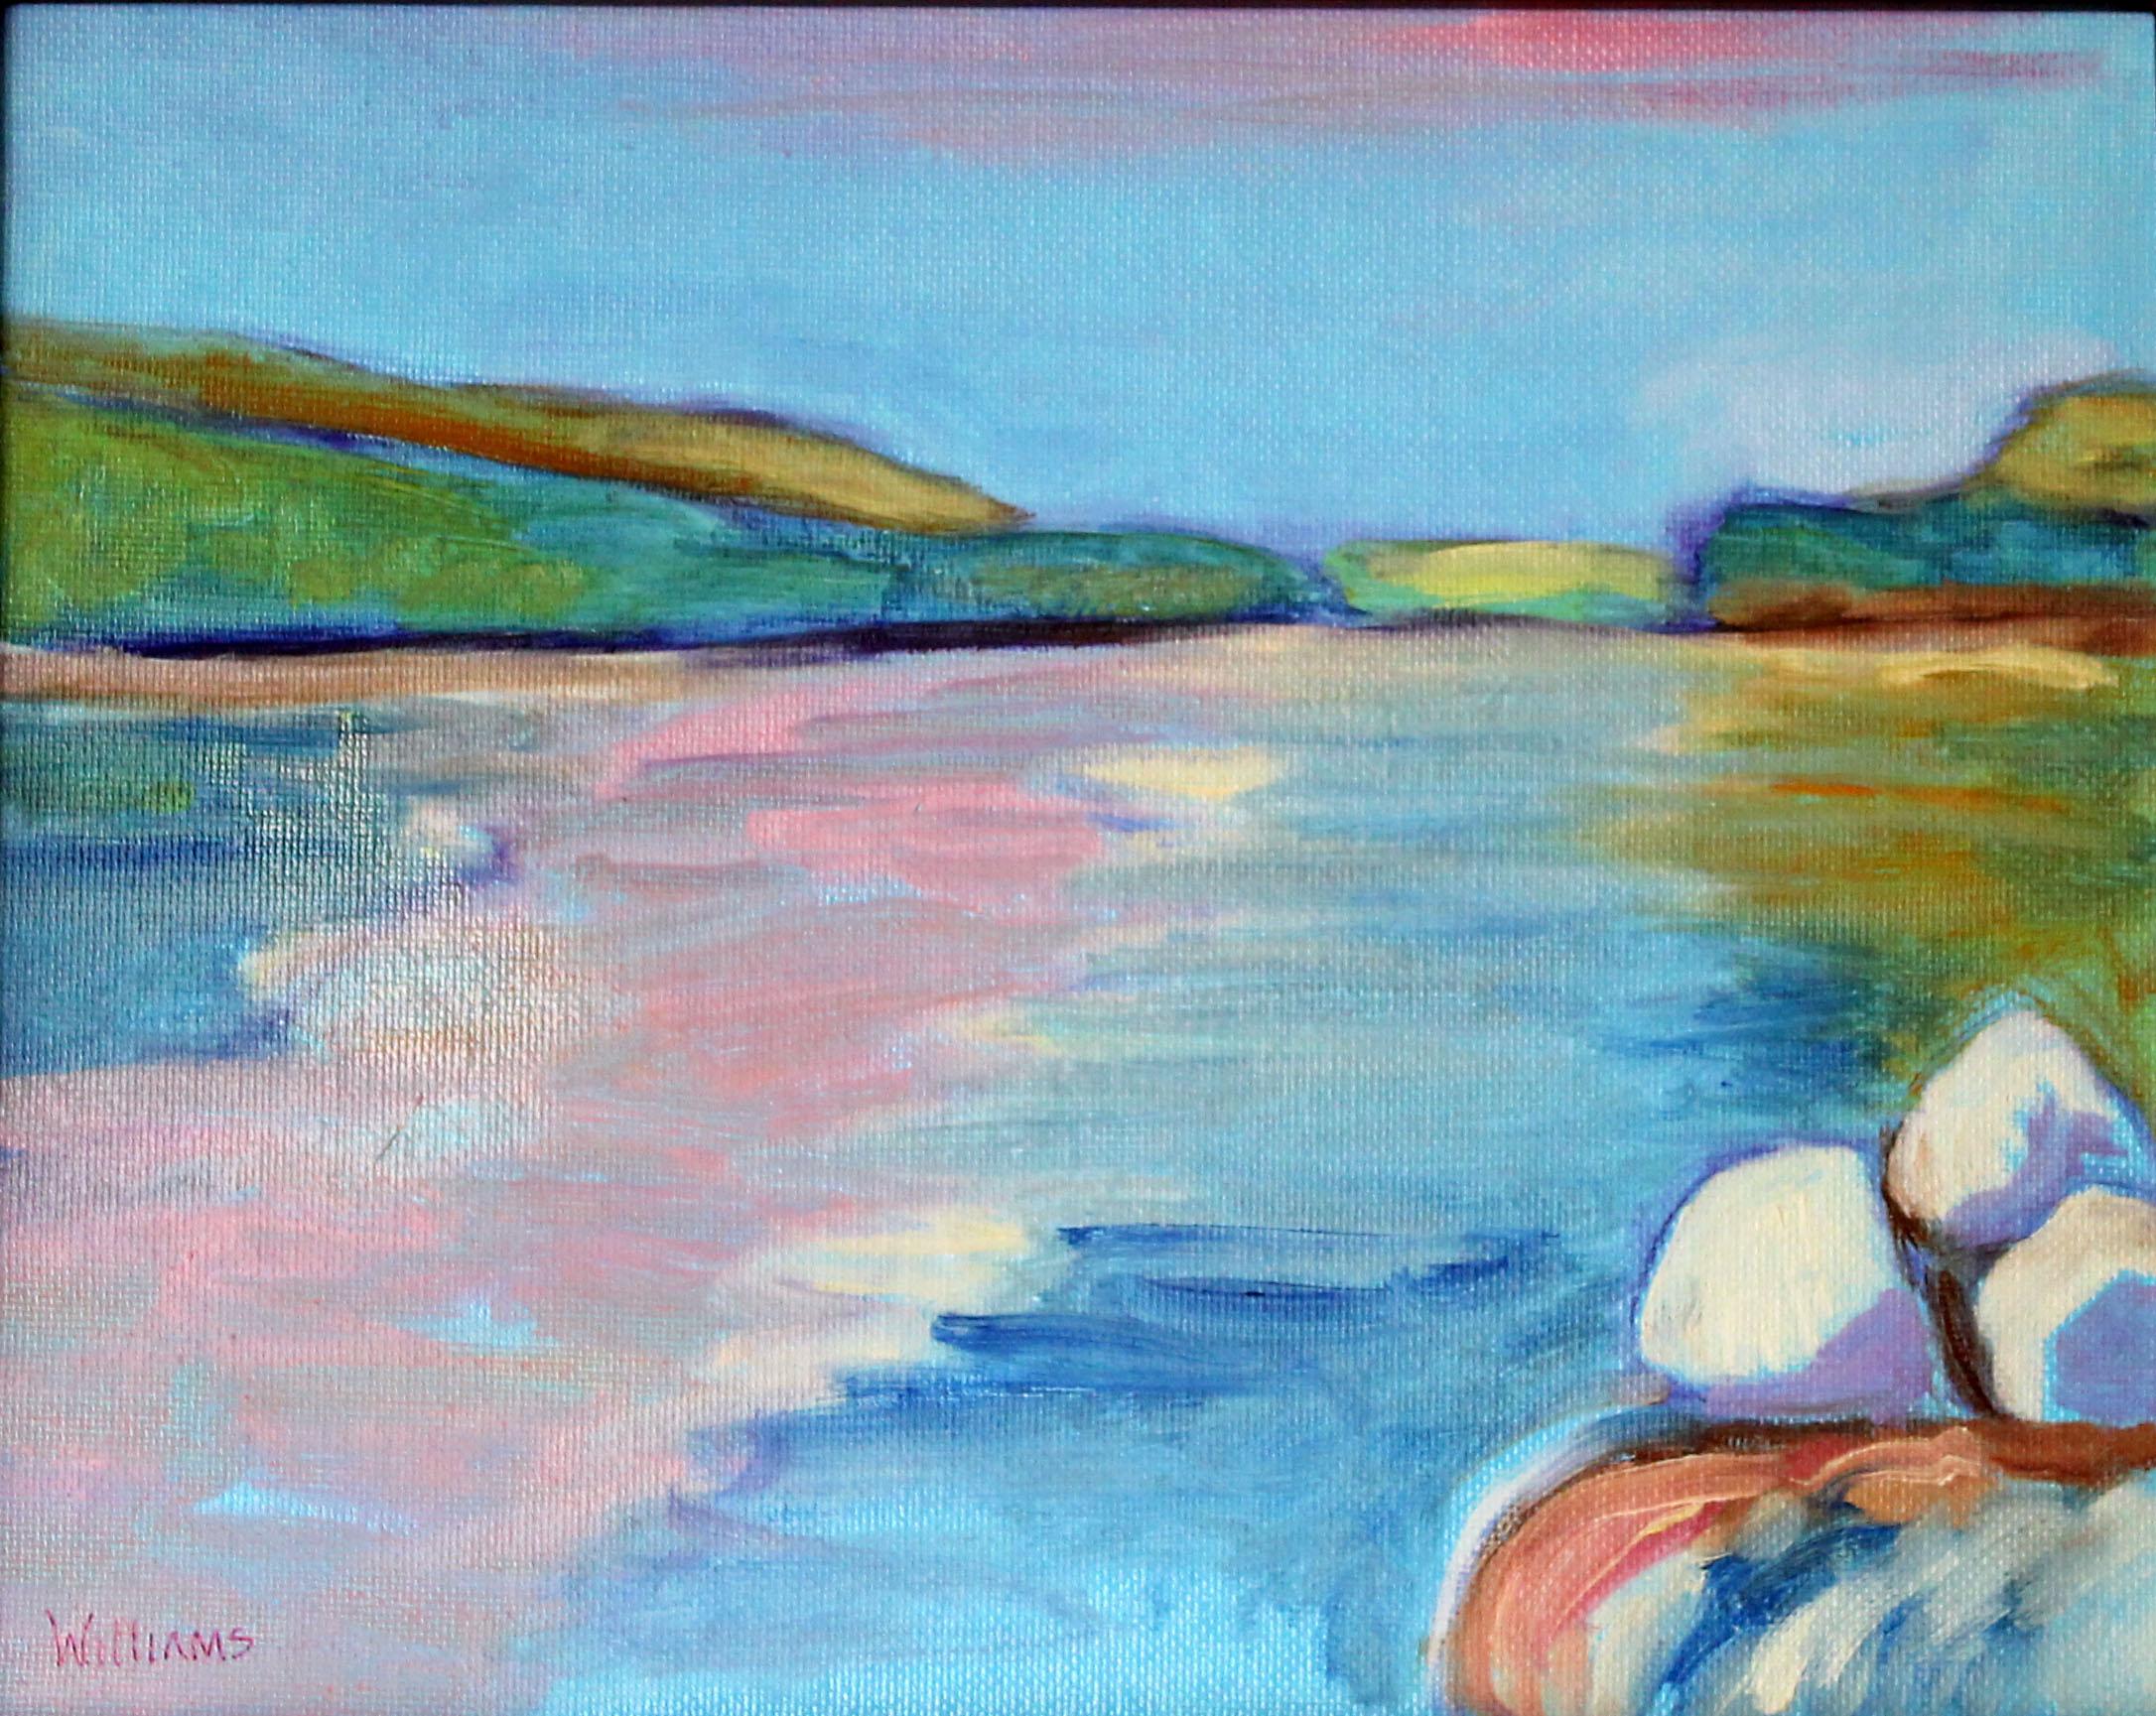 River Peace, Nancy Williams